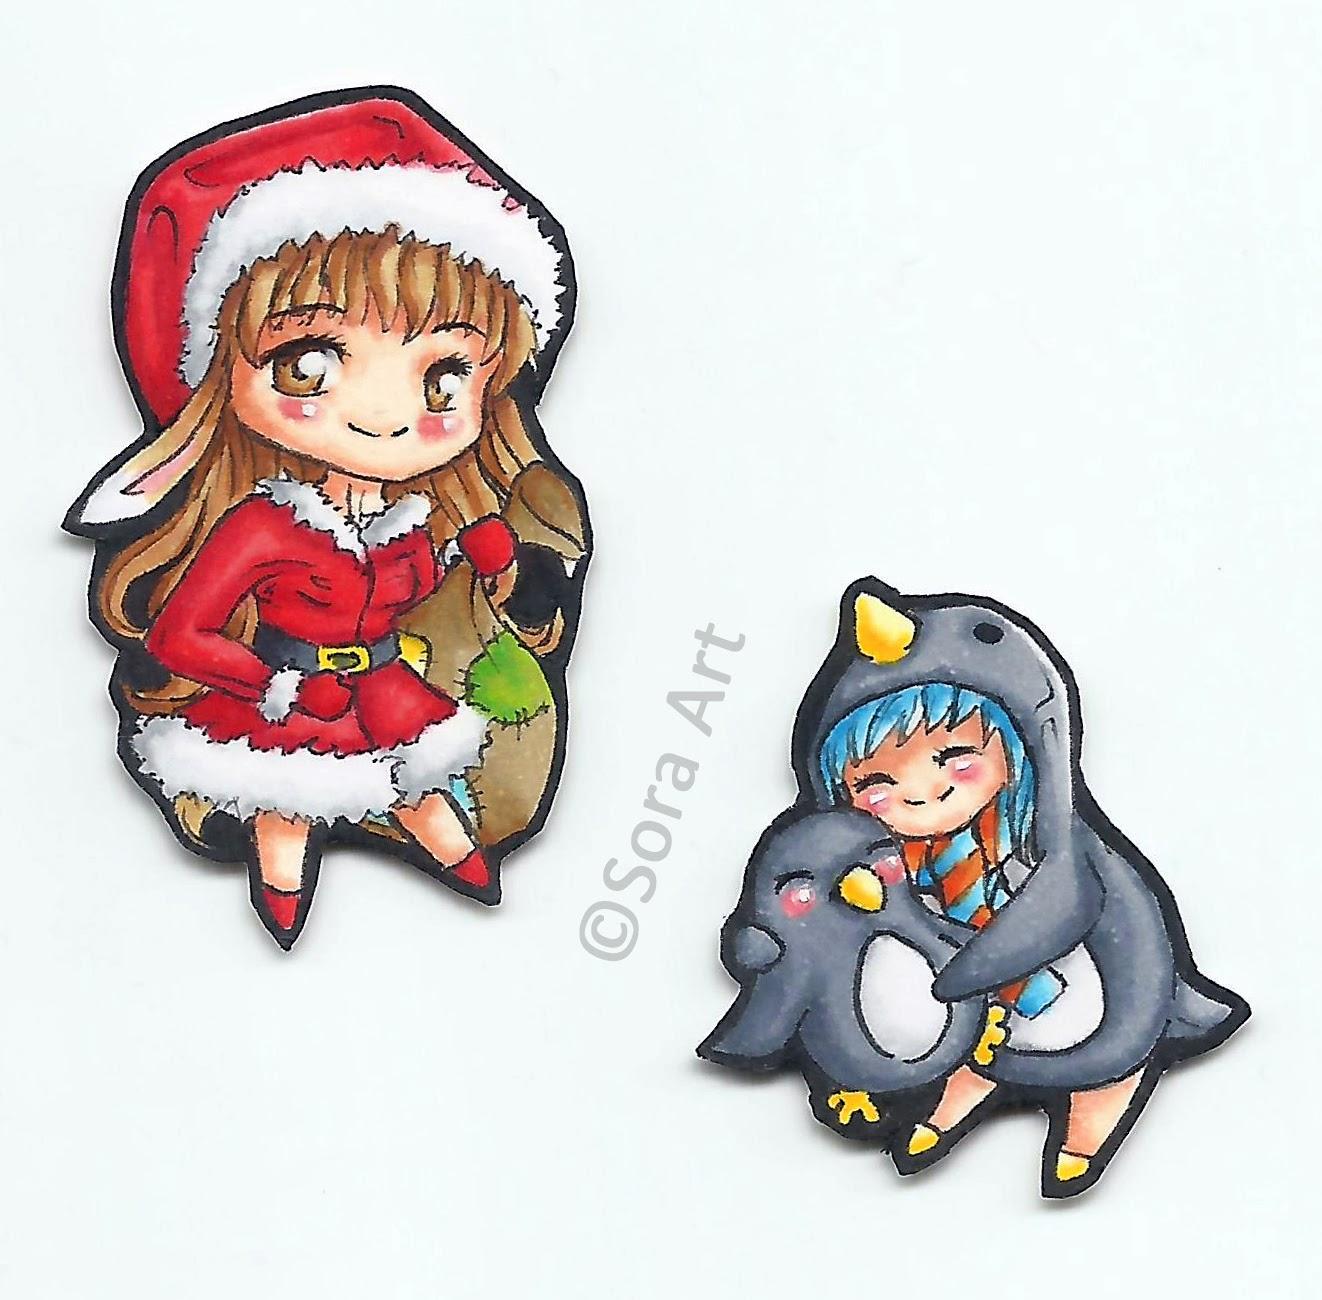 Sora Art: Januar 2014